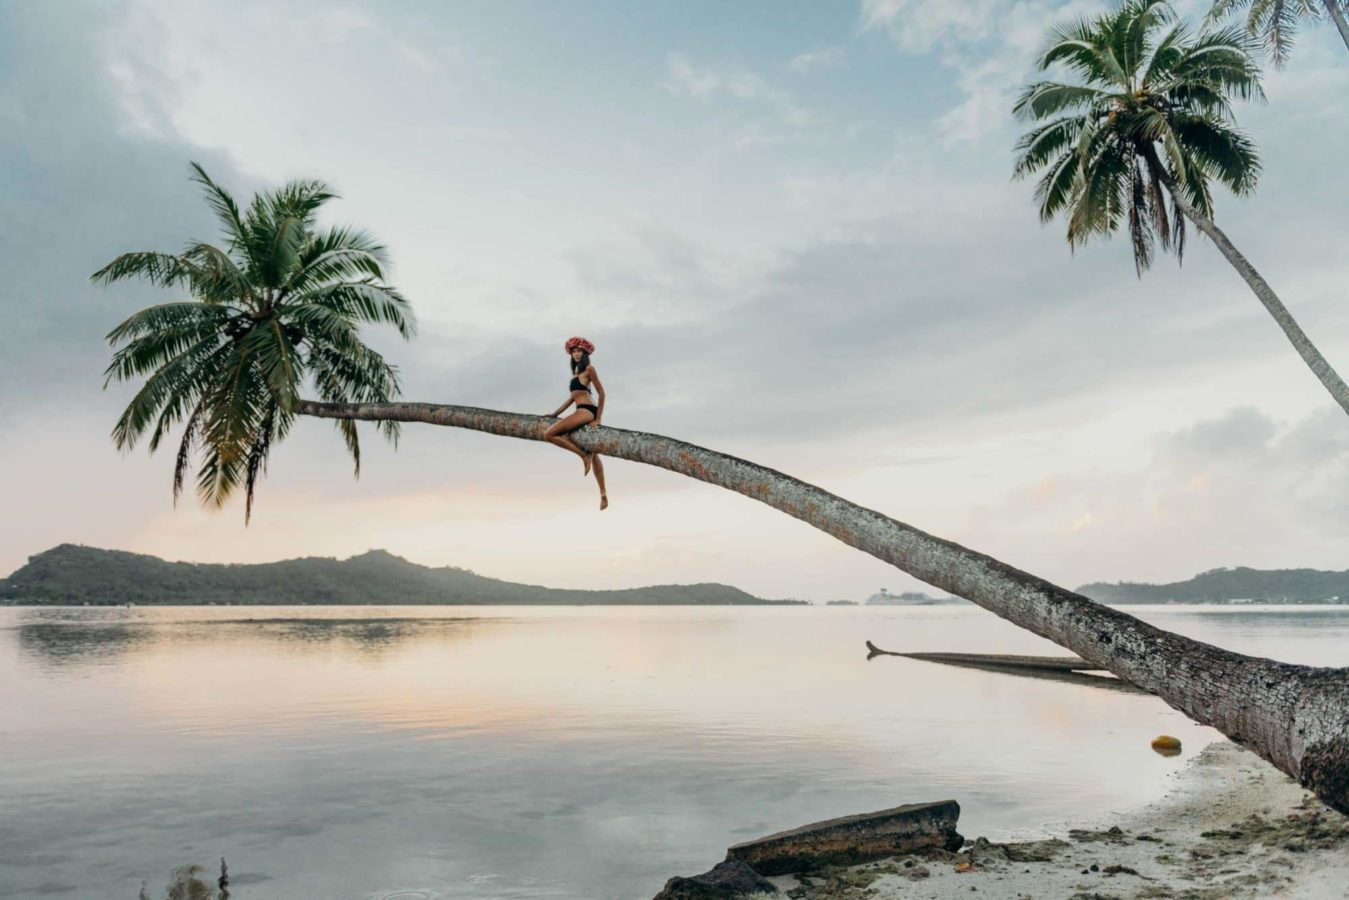 Bora Bora portrait photographer